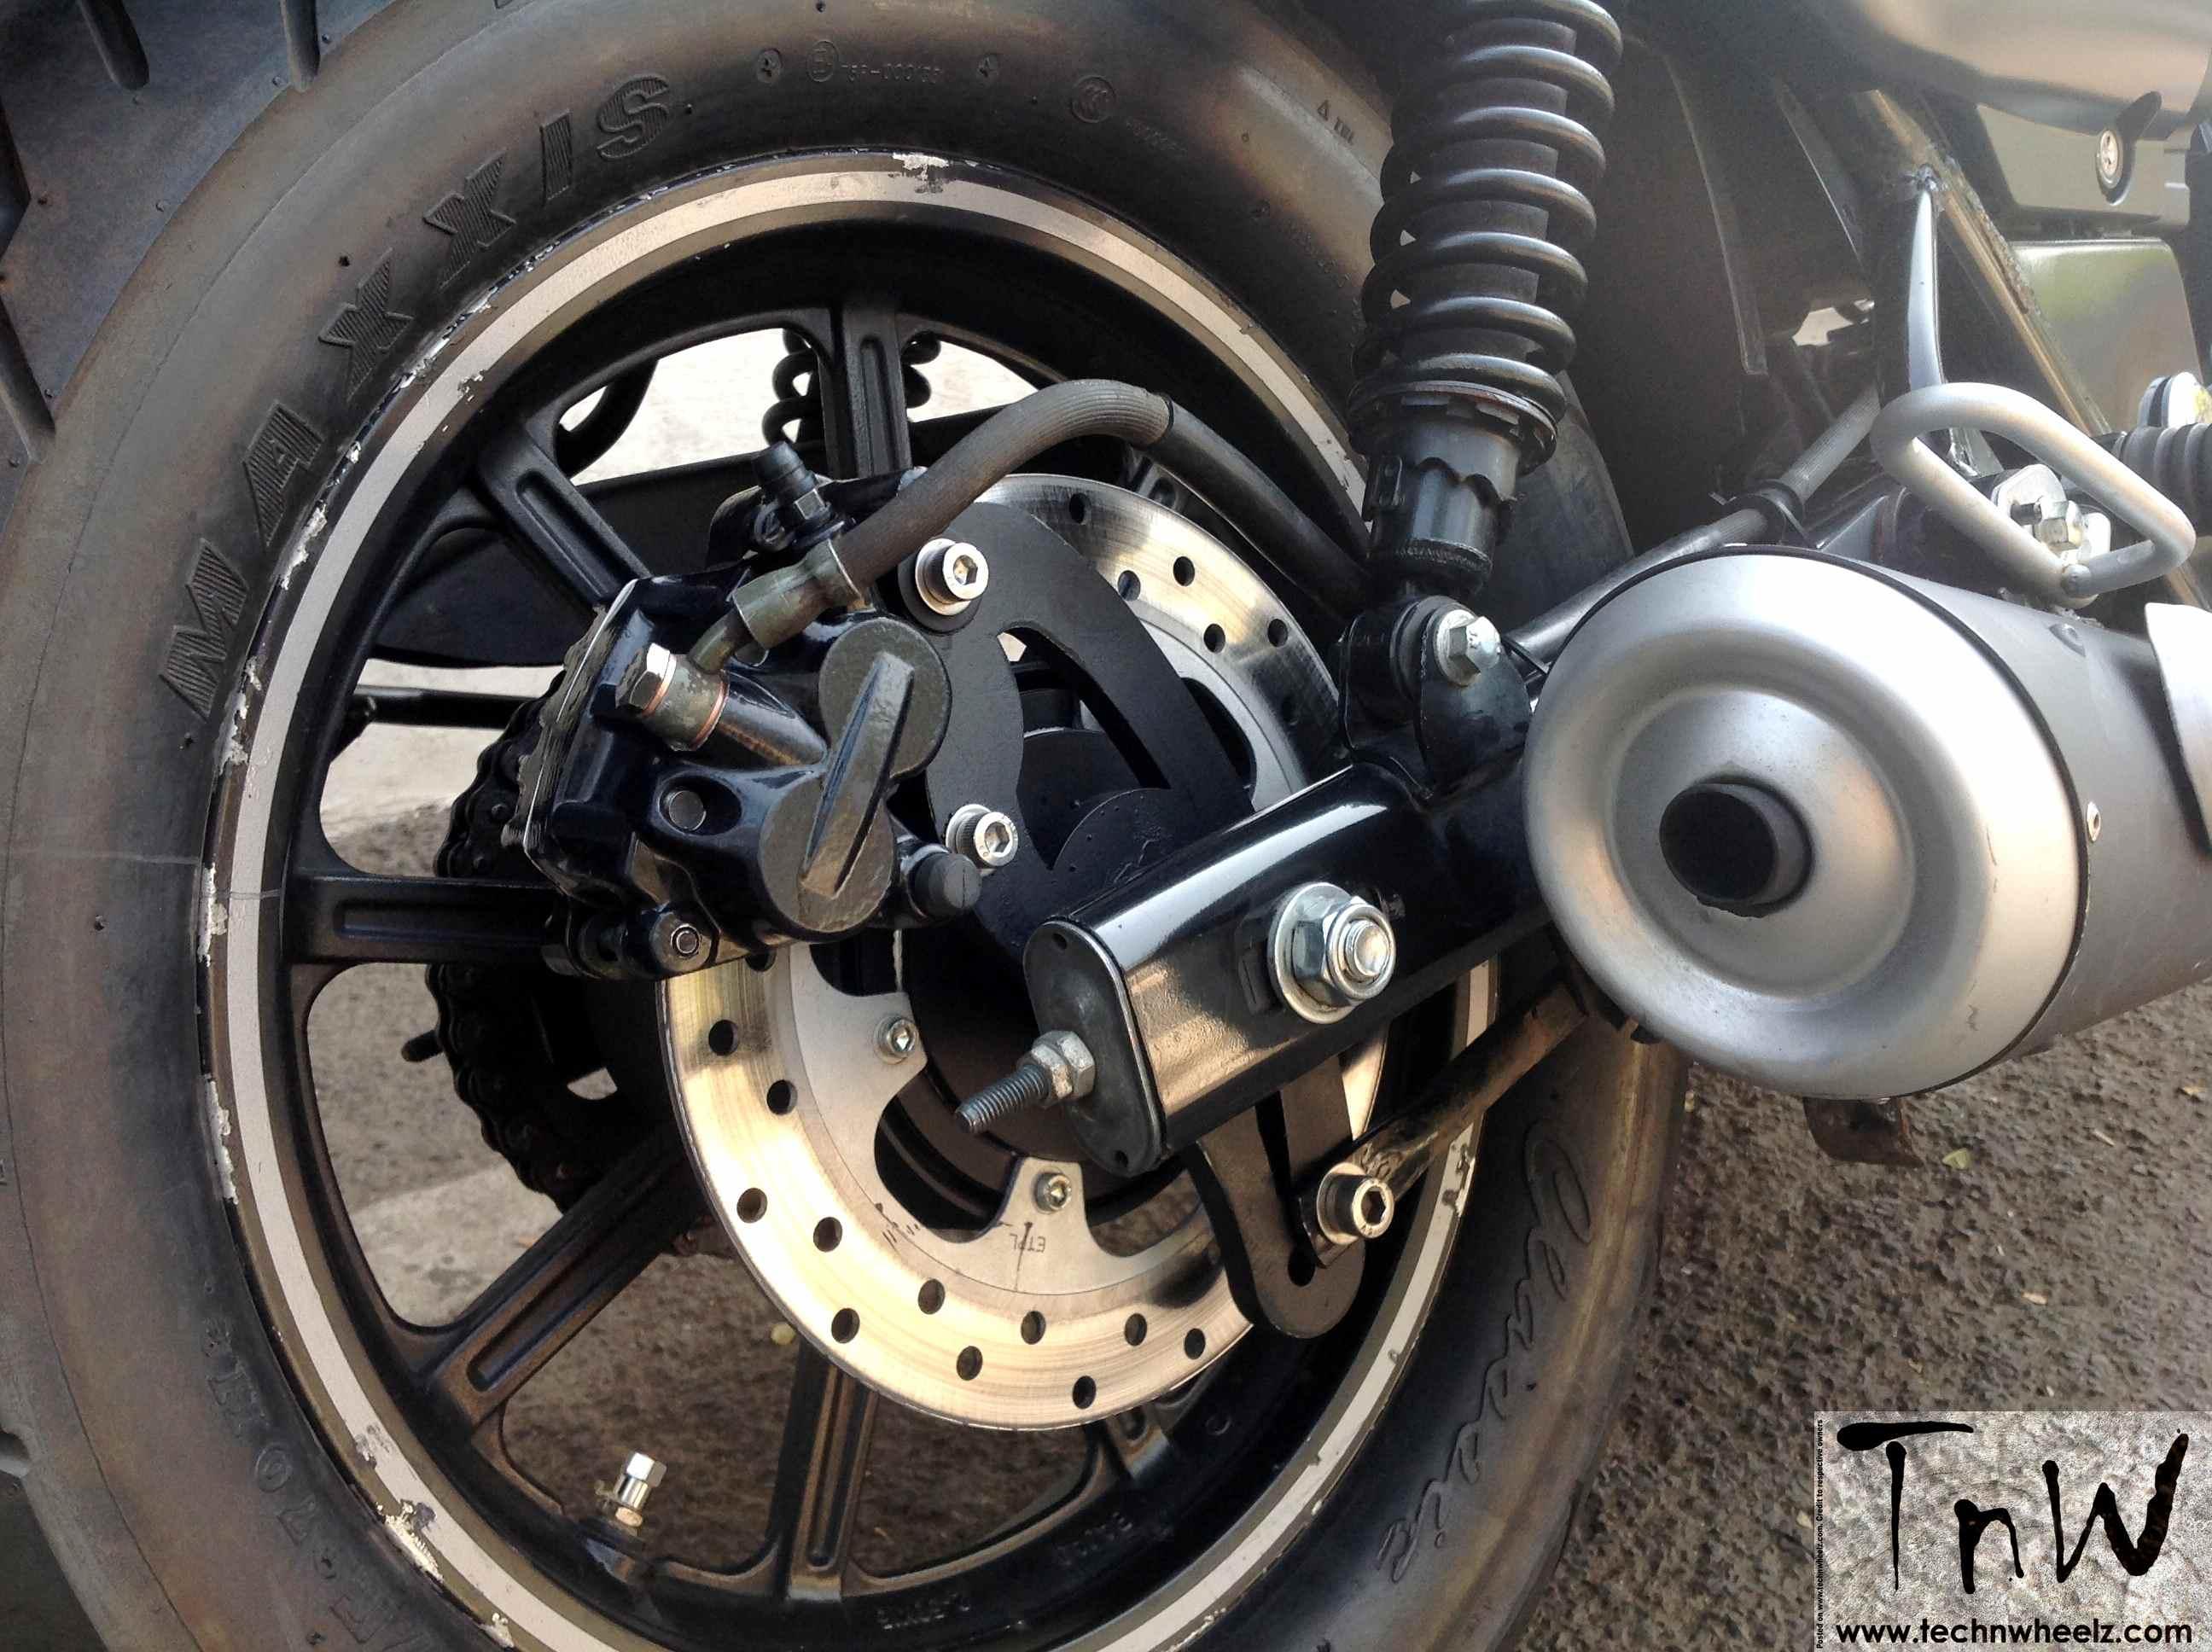 Bajaj Avenger Street 220 Gets Rear Disc And Hydraulic Clutch Brakes Westland Customs 7 Rotor